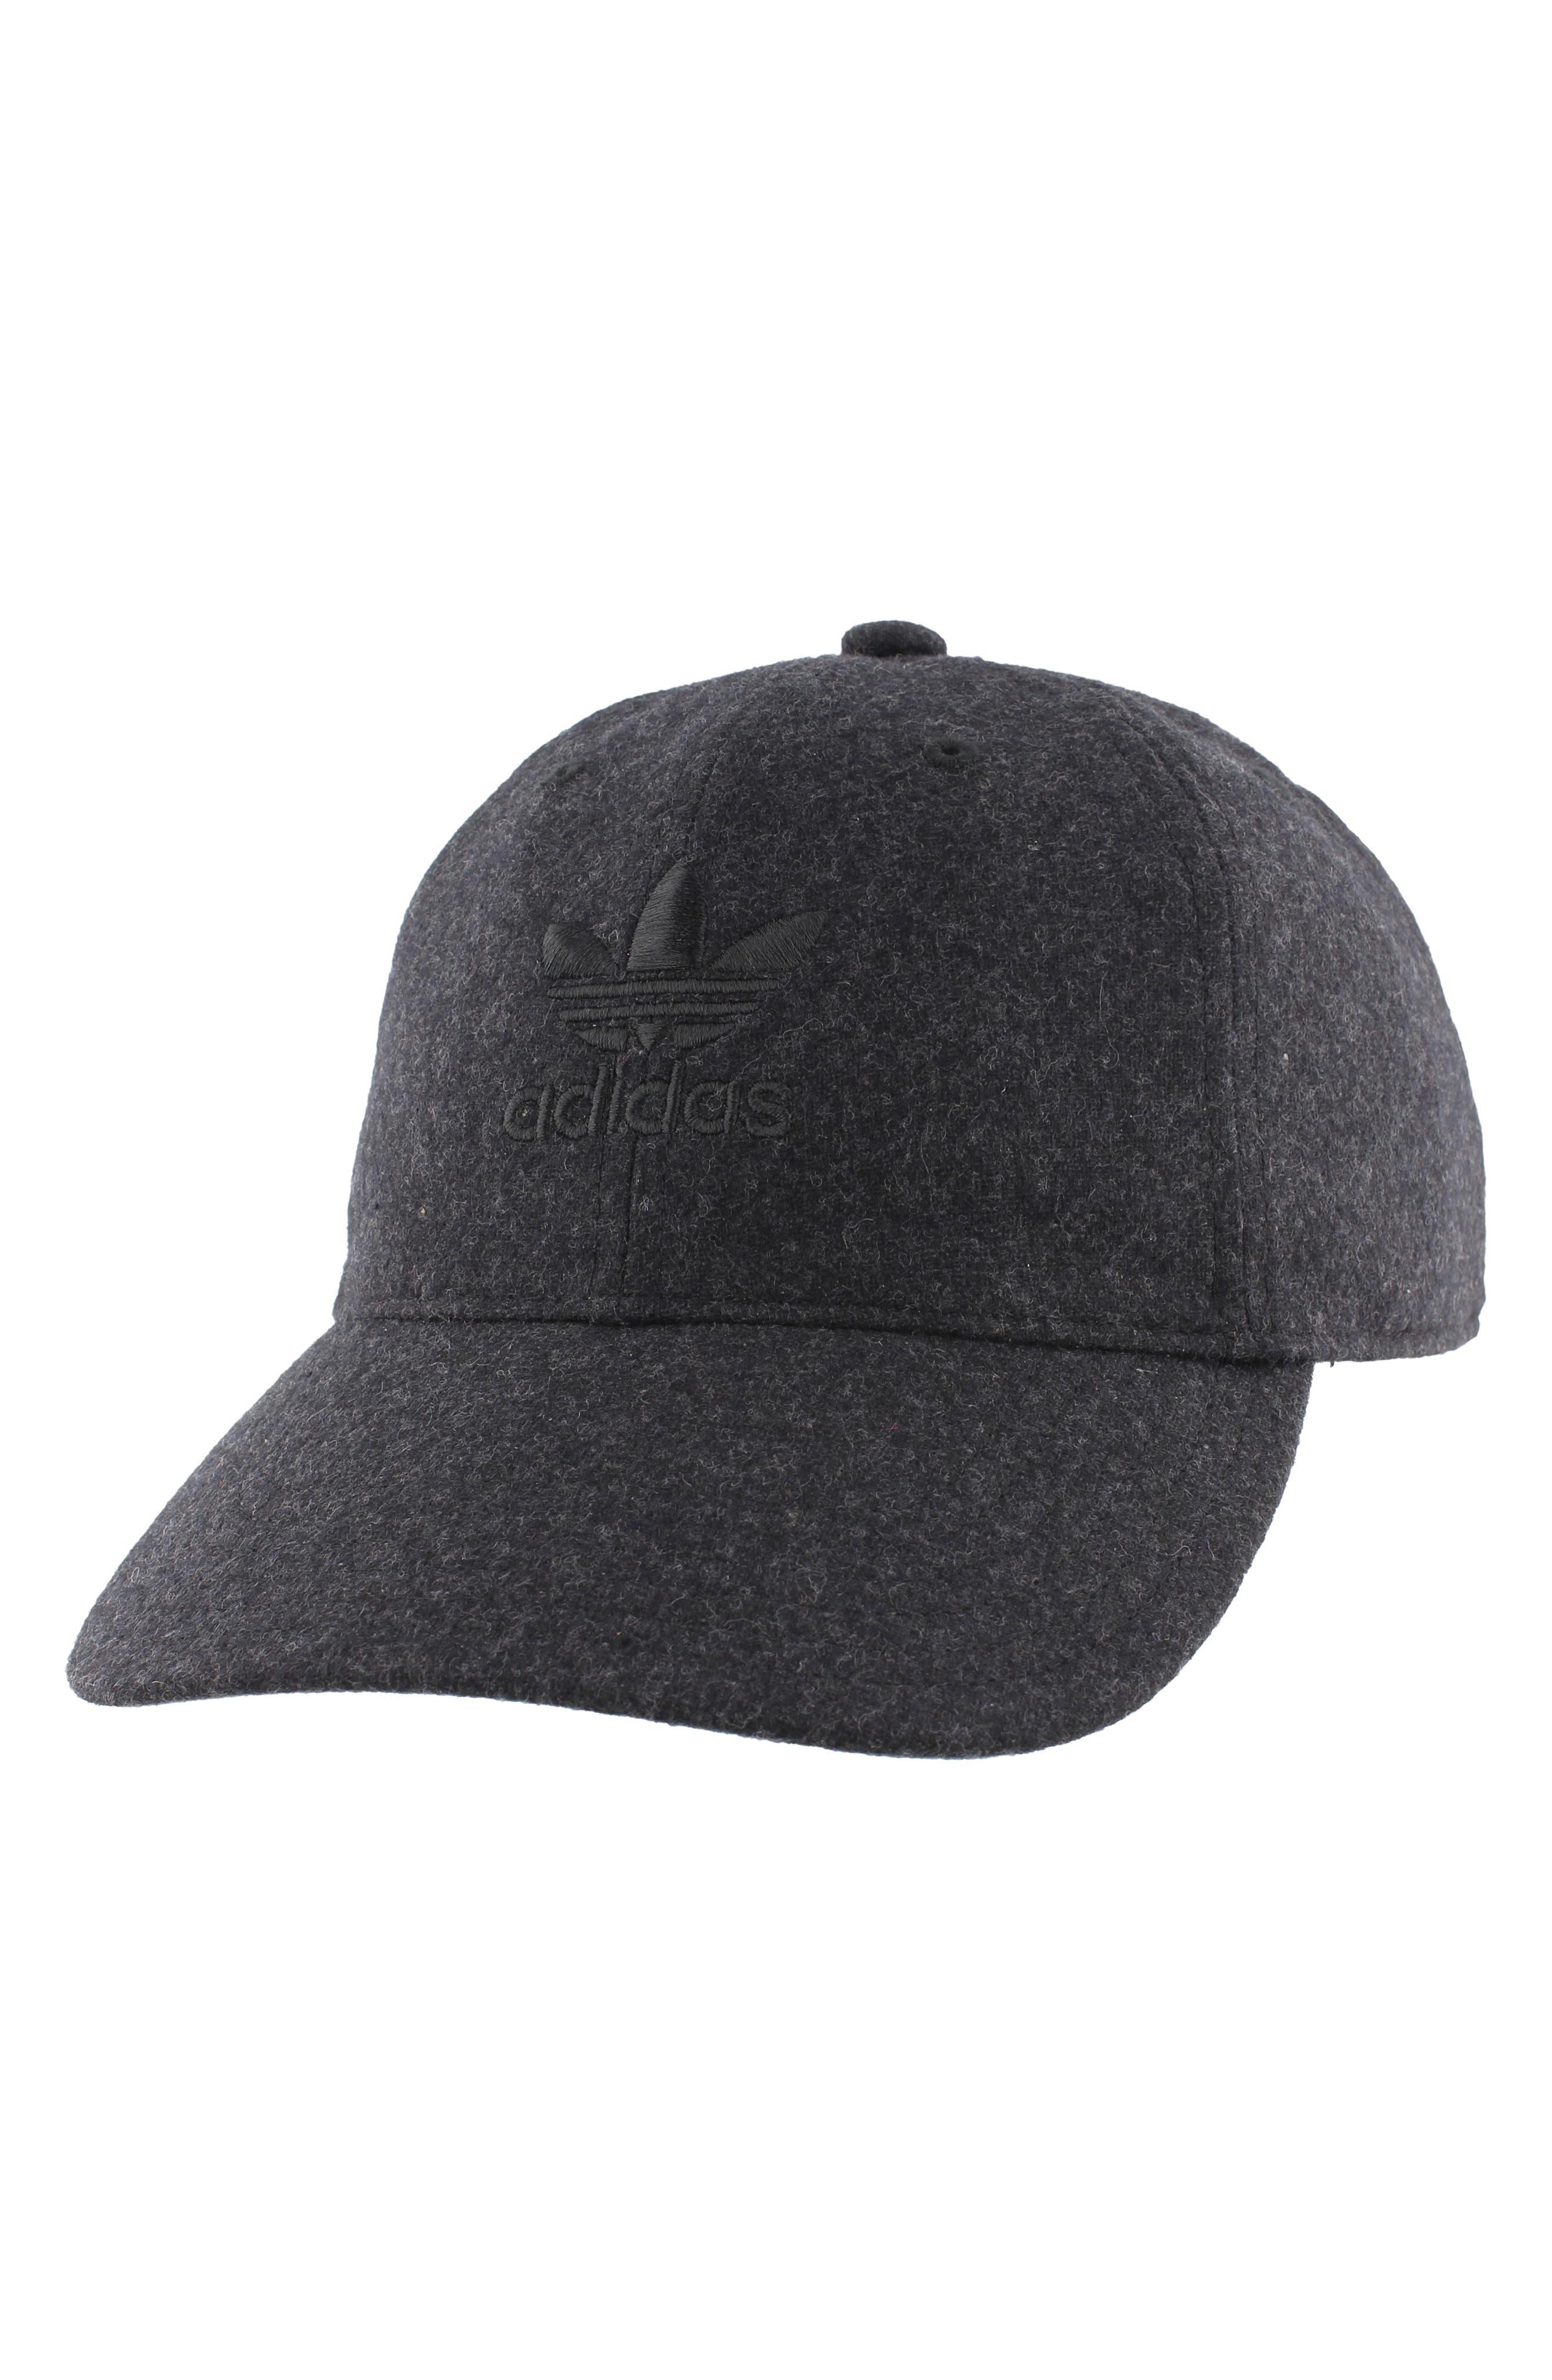 adidas Originals Relaxed Plus Baseball Cap